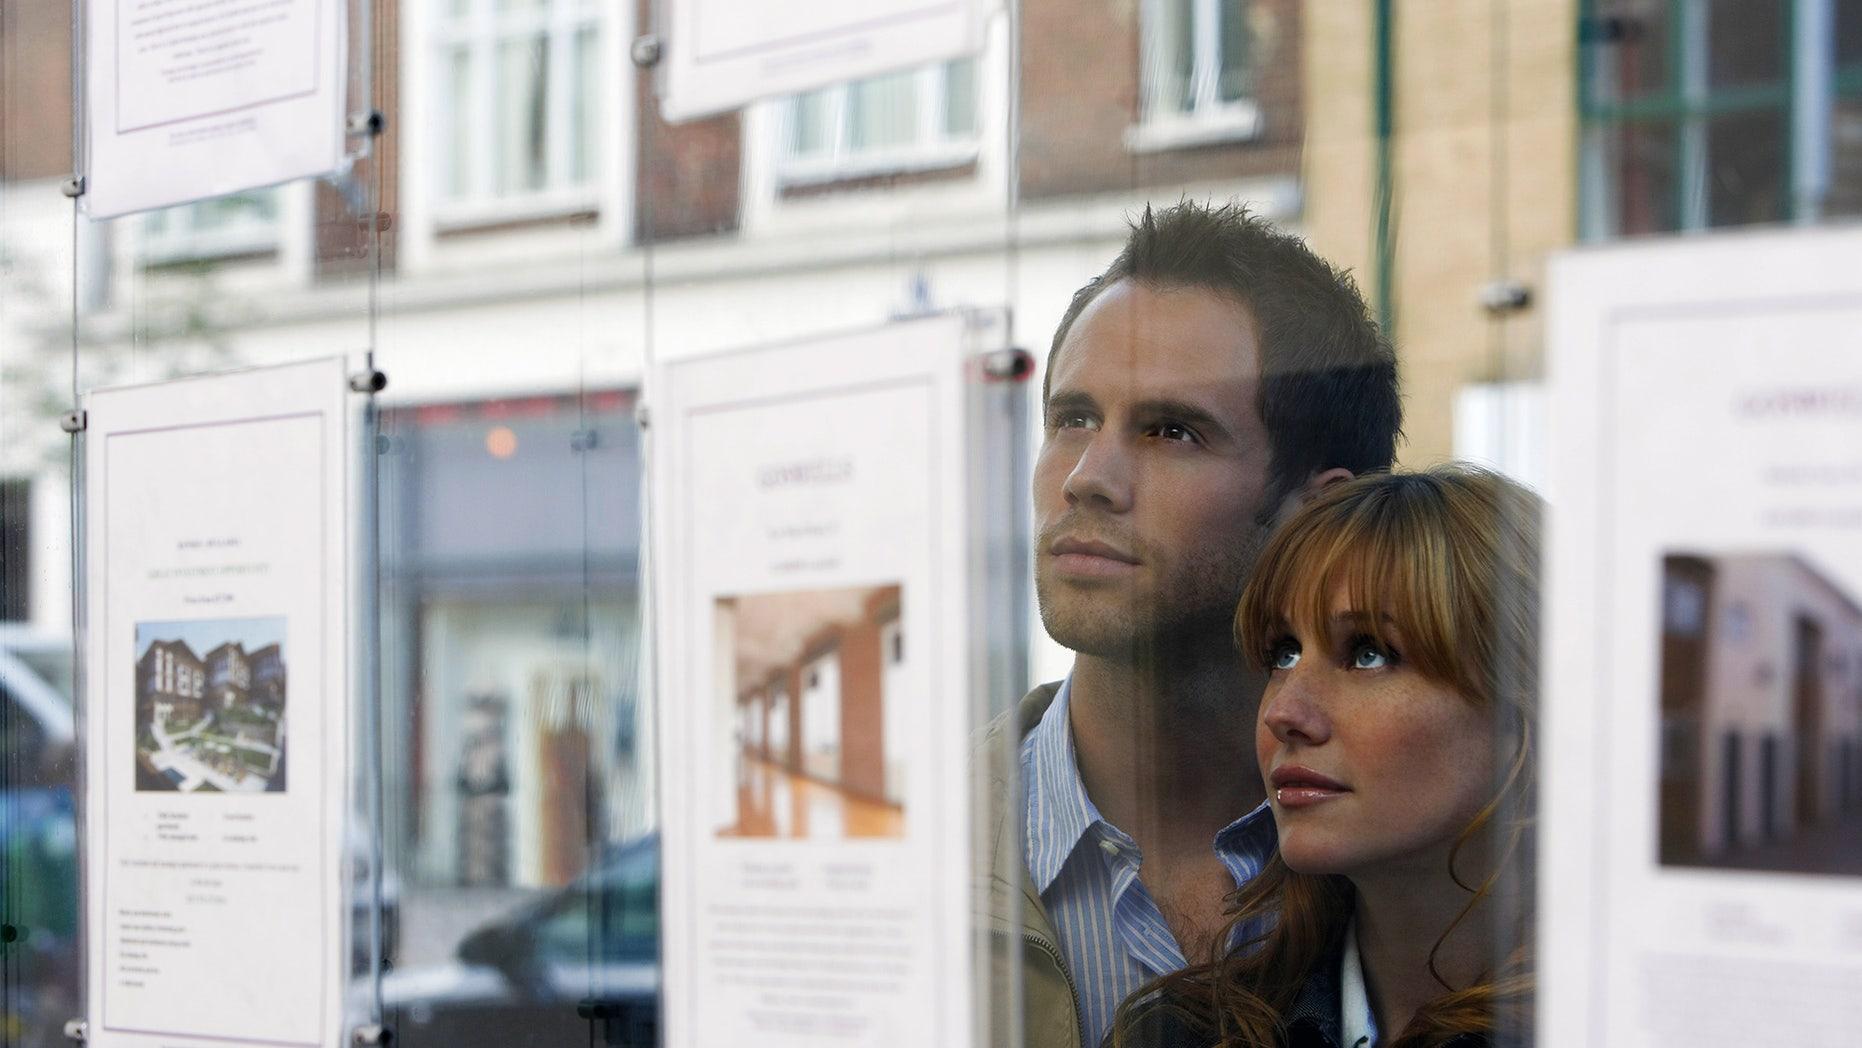 real-estate-window-shopping